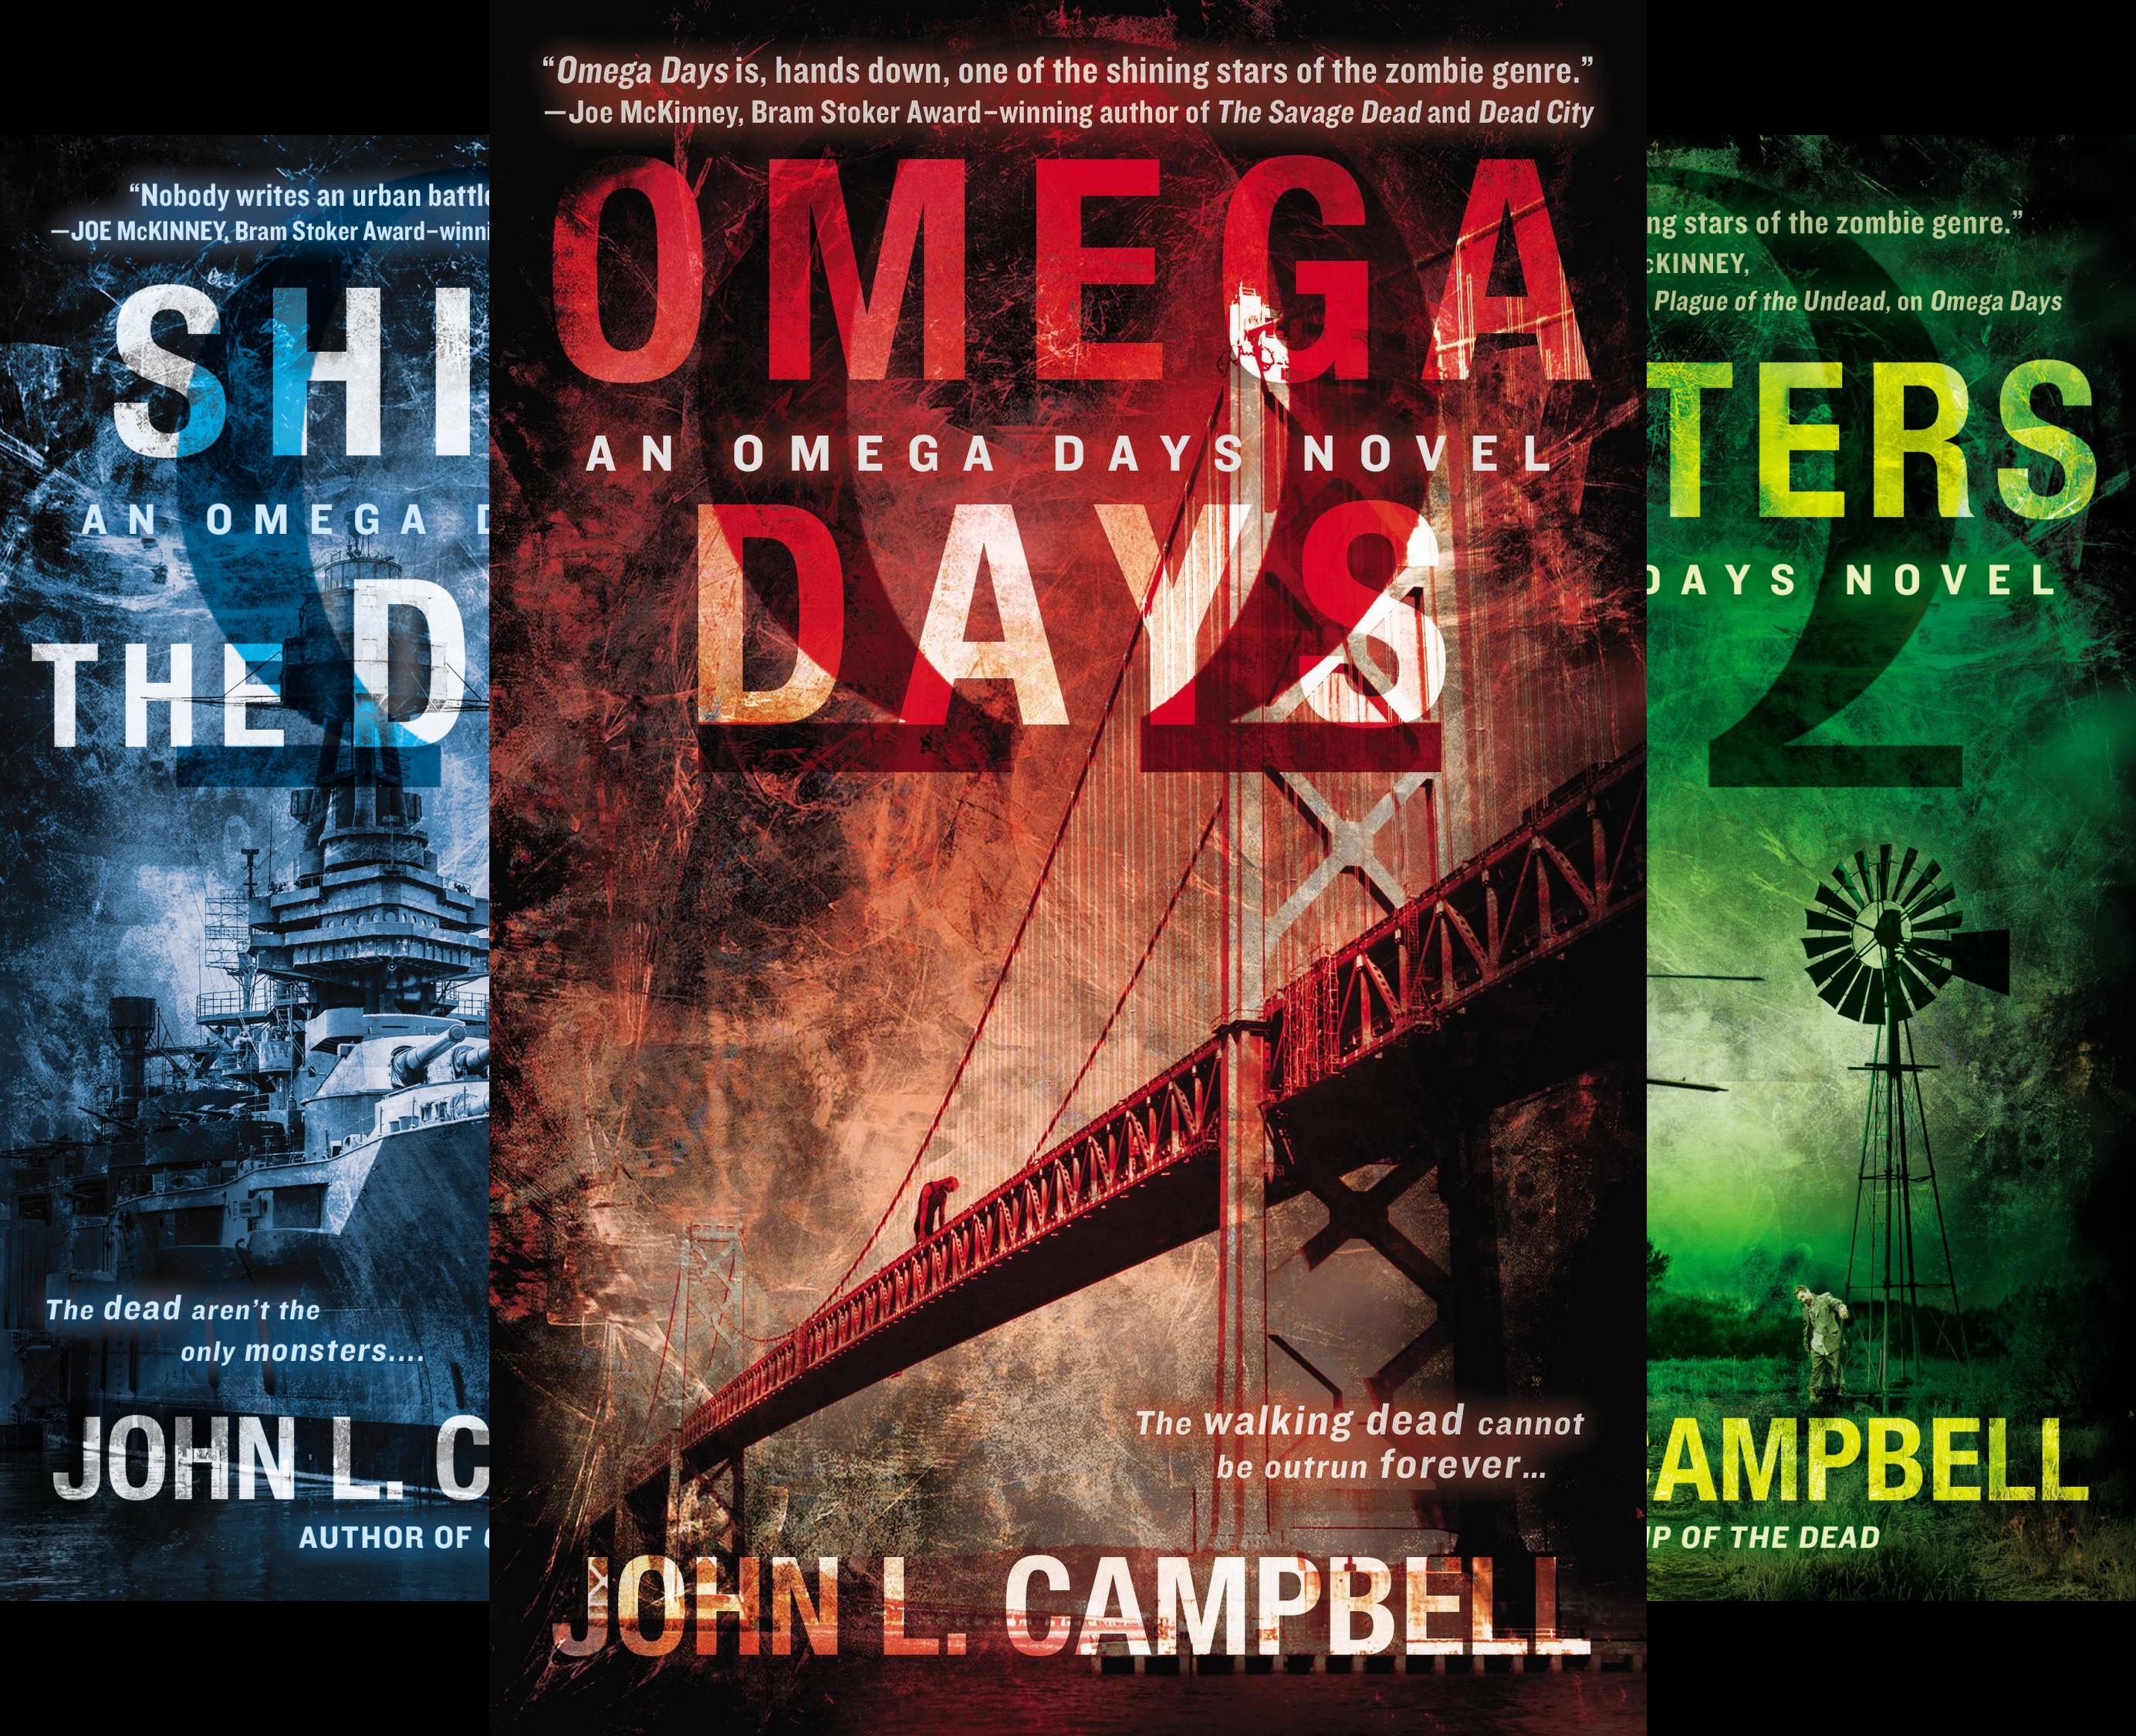 An Omega Days Novel (3 Book Series) @ niftywarehouse.com #NiftyWarehouse #Zombie #Horror #Zombies #Halloween